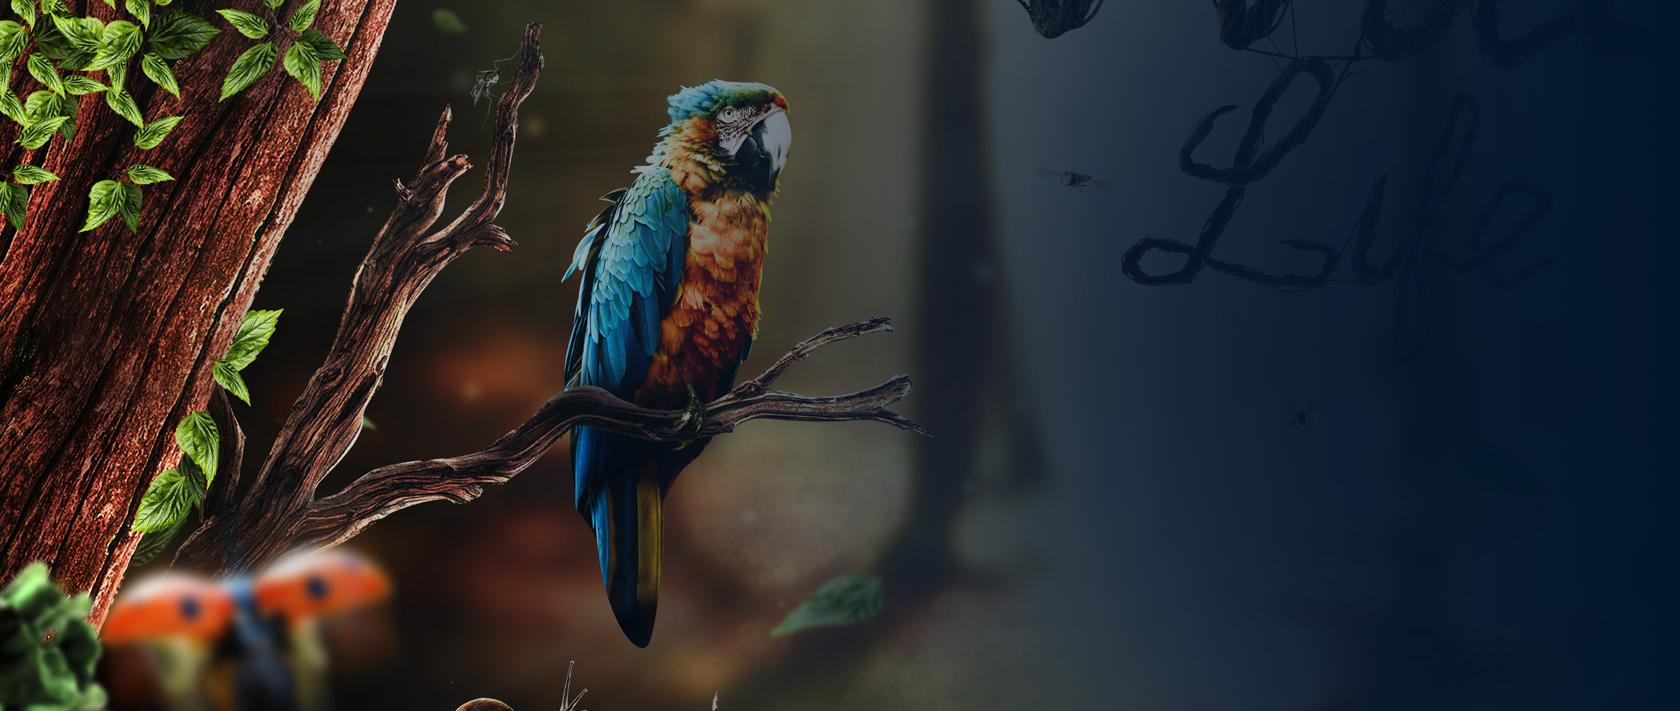 Digital art project WildLife